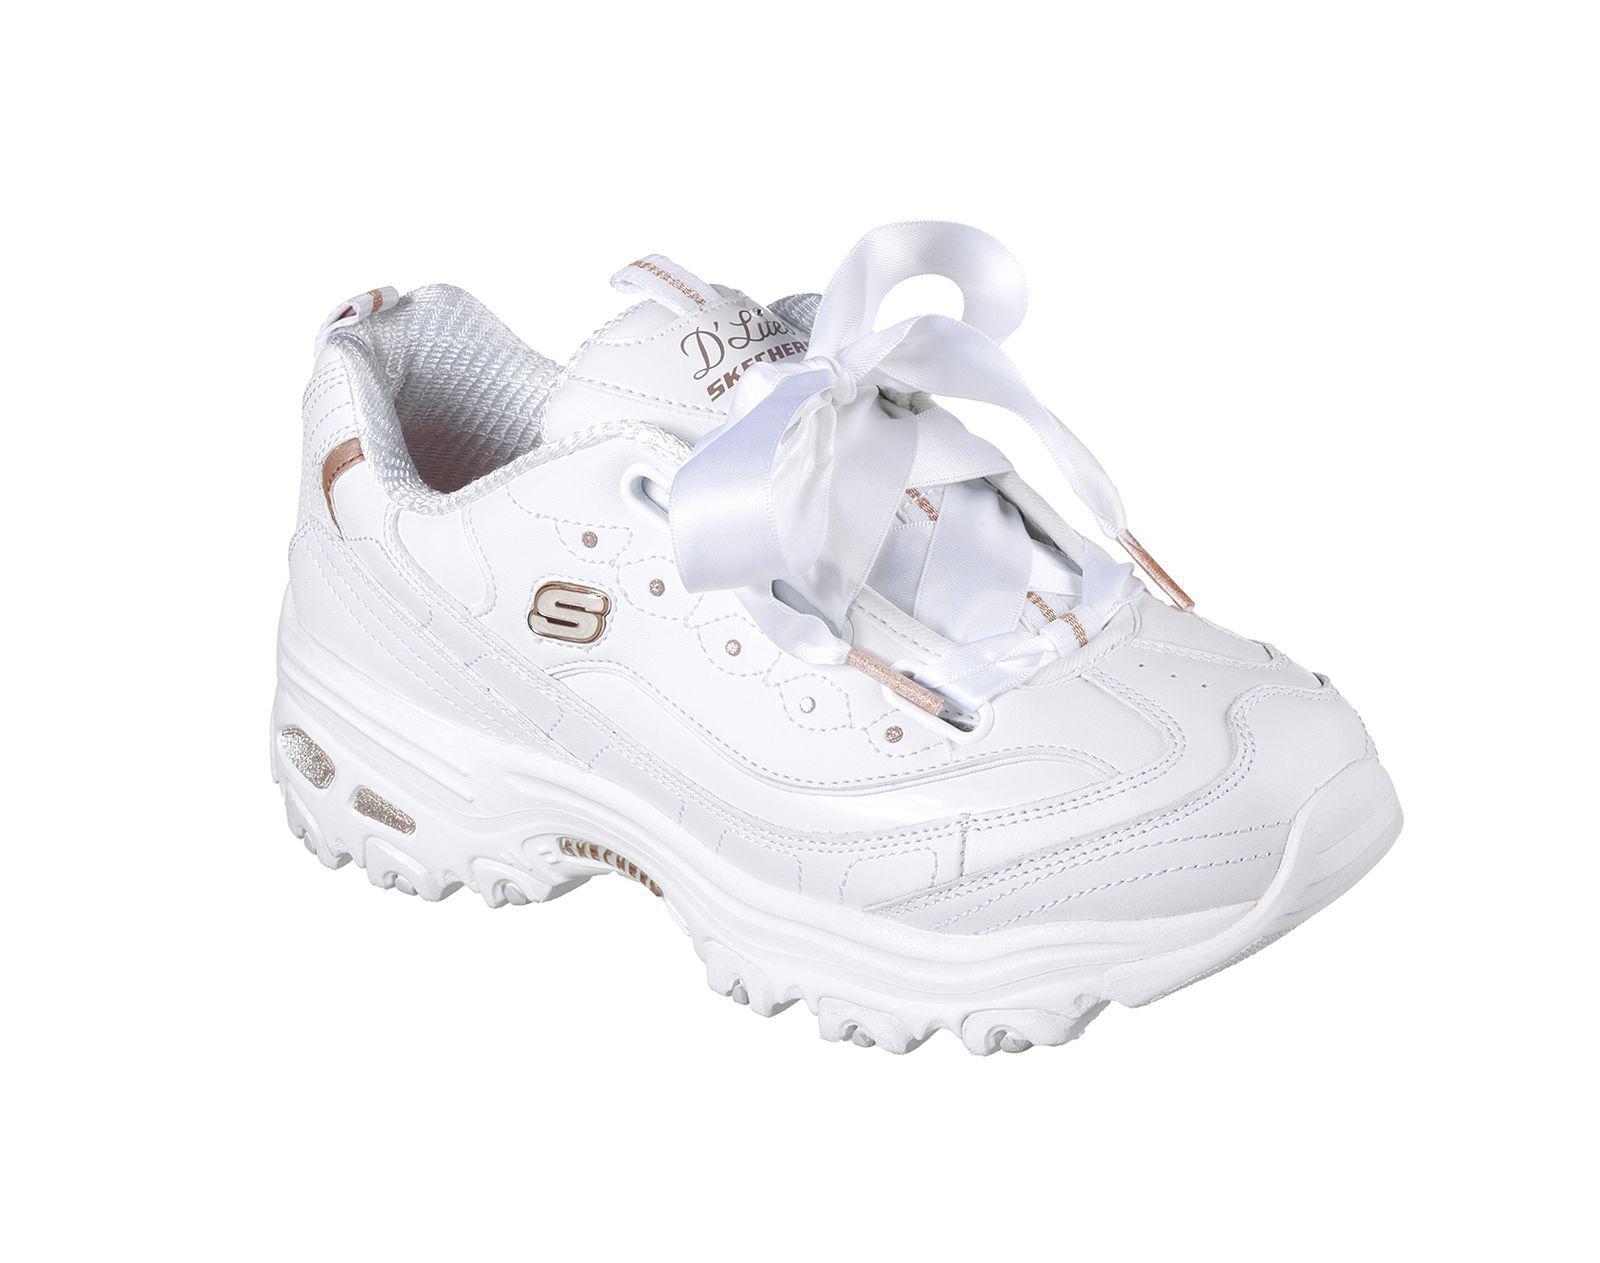 Sneakers blancas: las favoritas de la primavera | Zapato